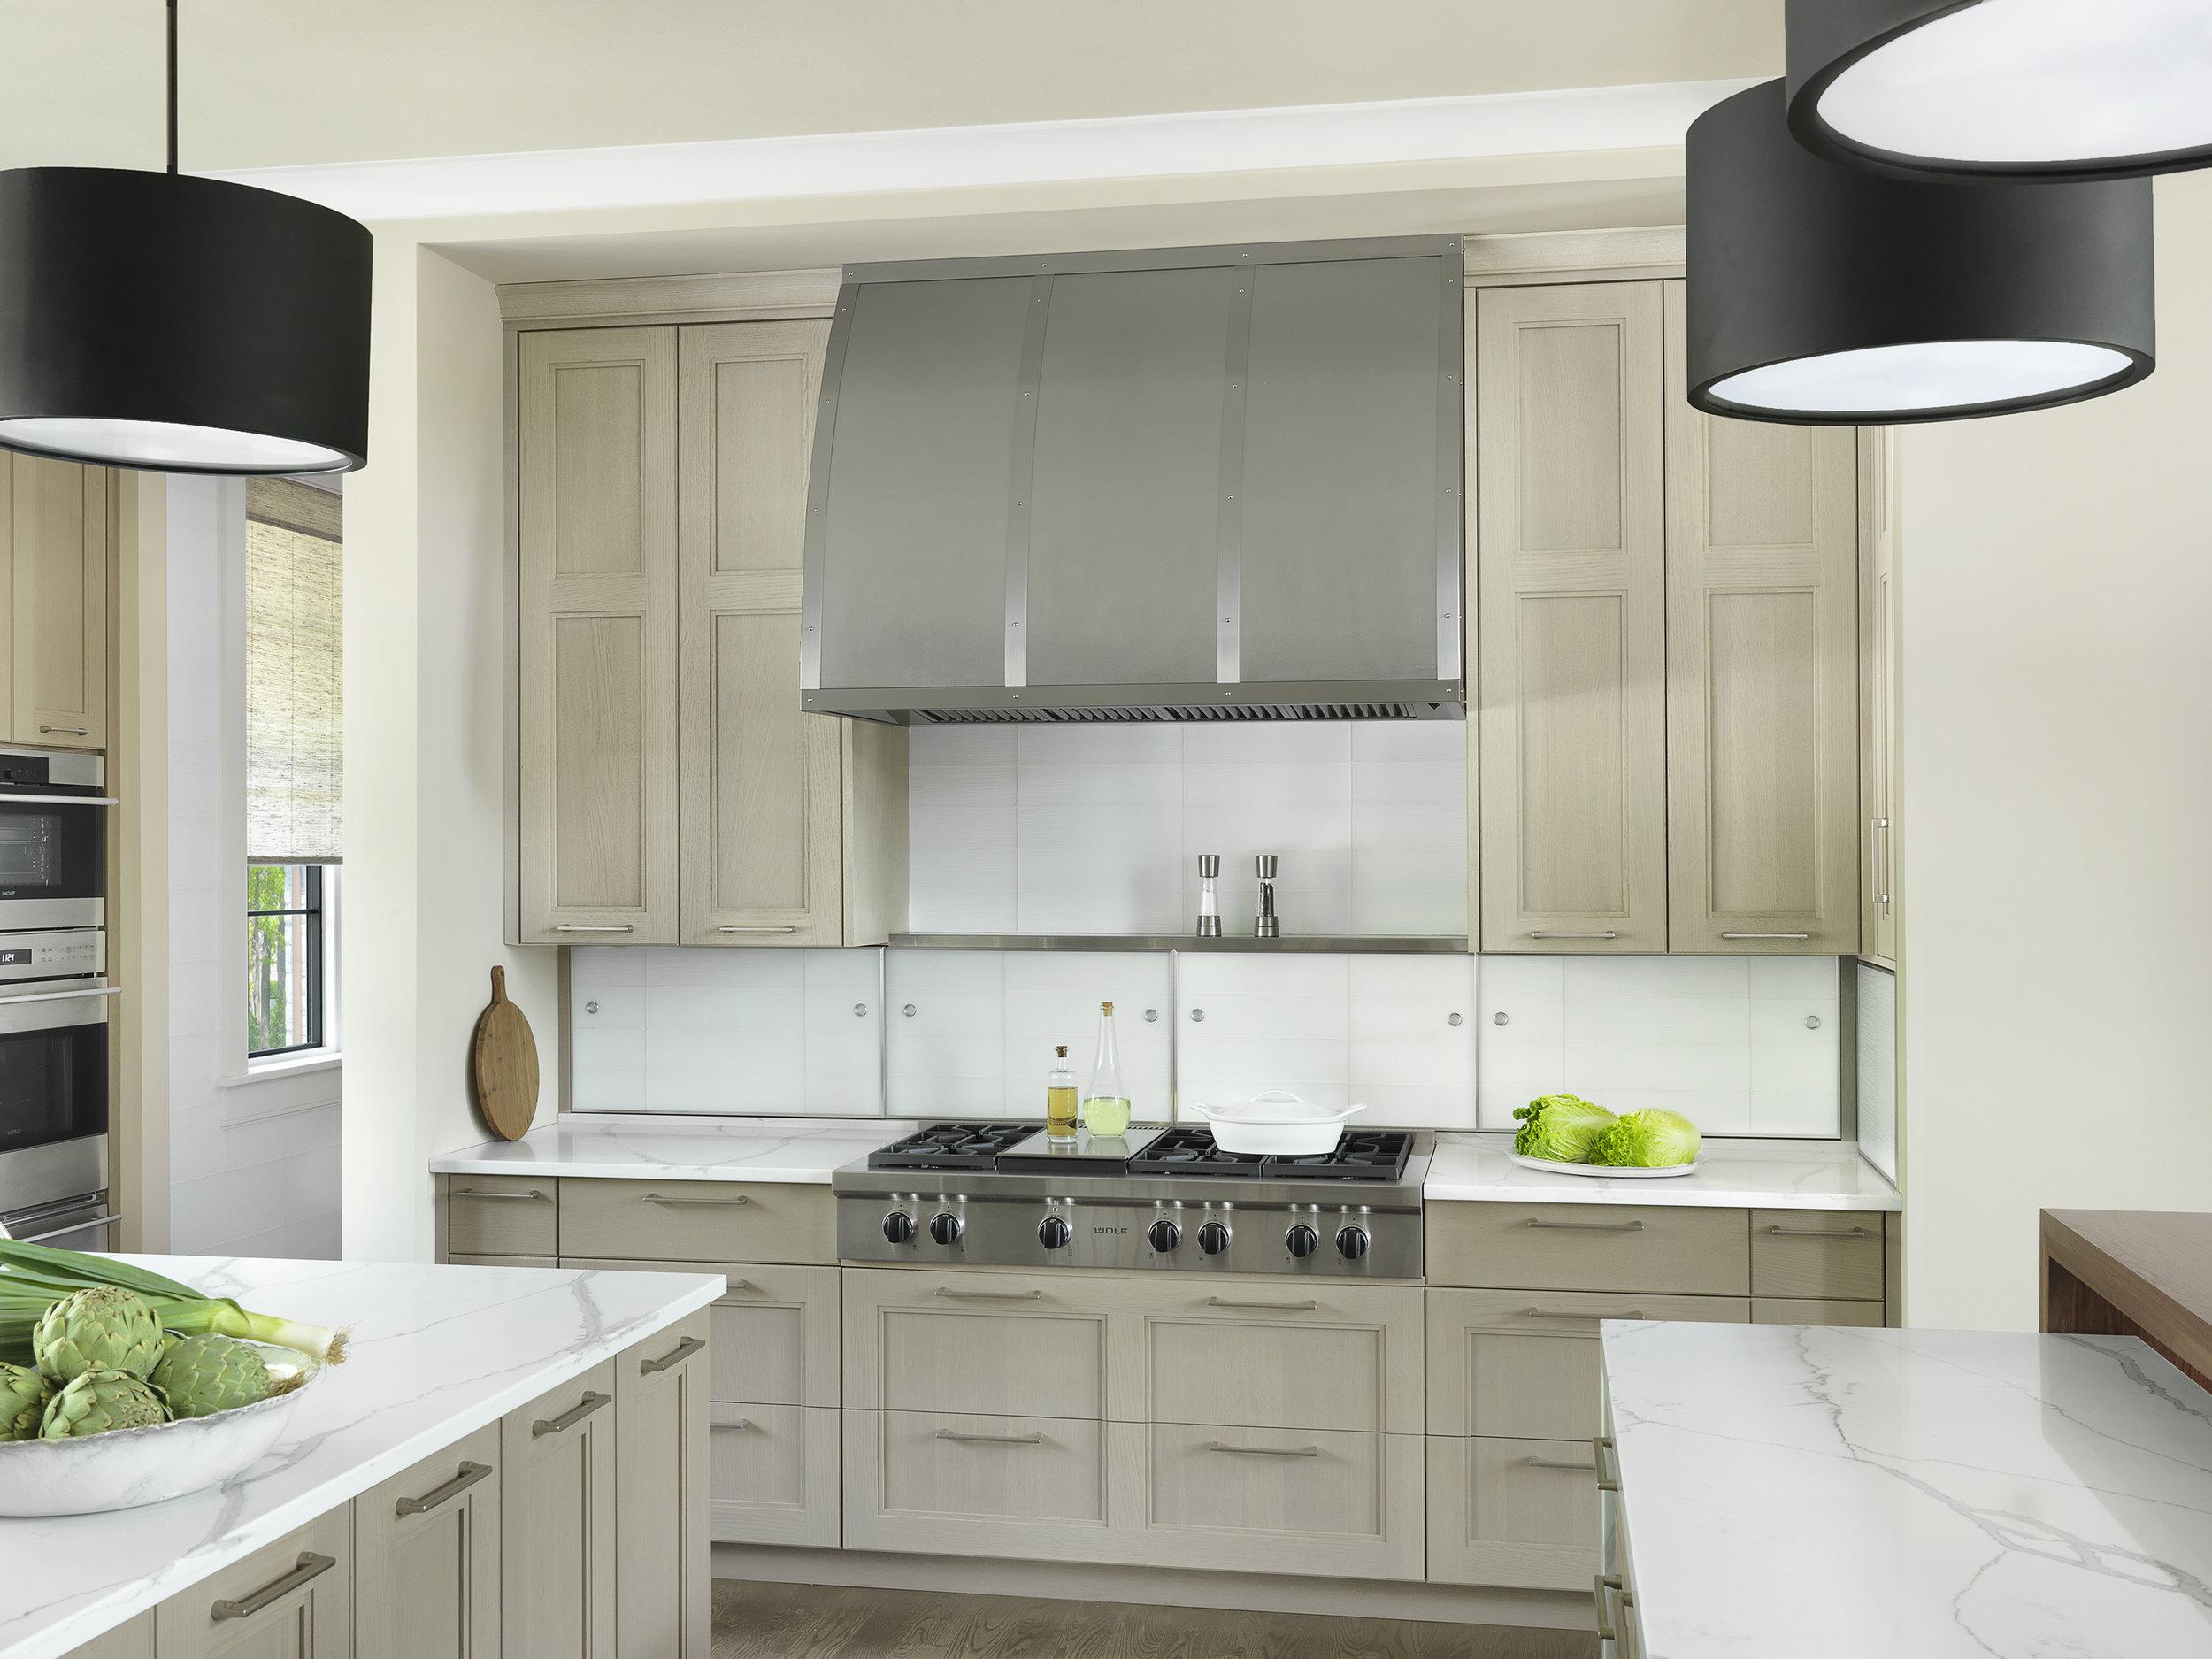 Kitchen_TowardsRange.jpg